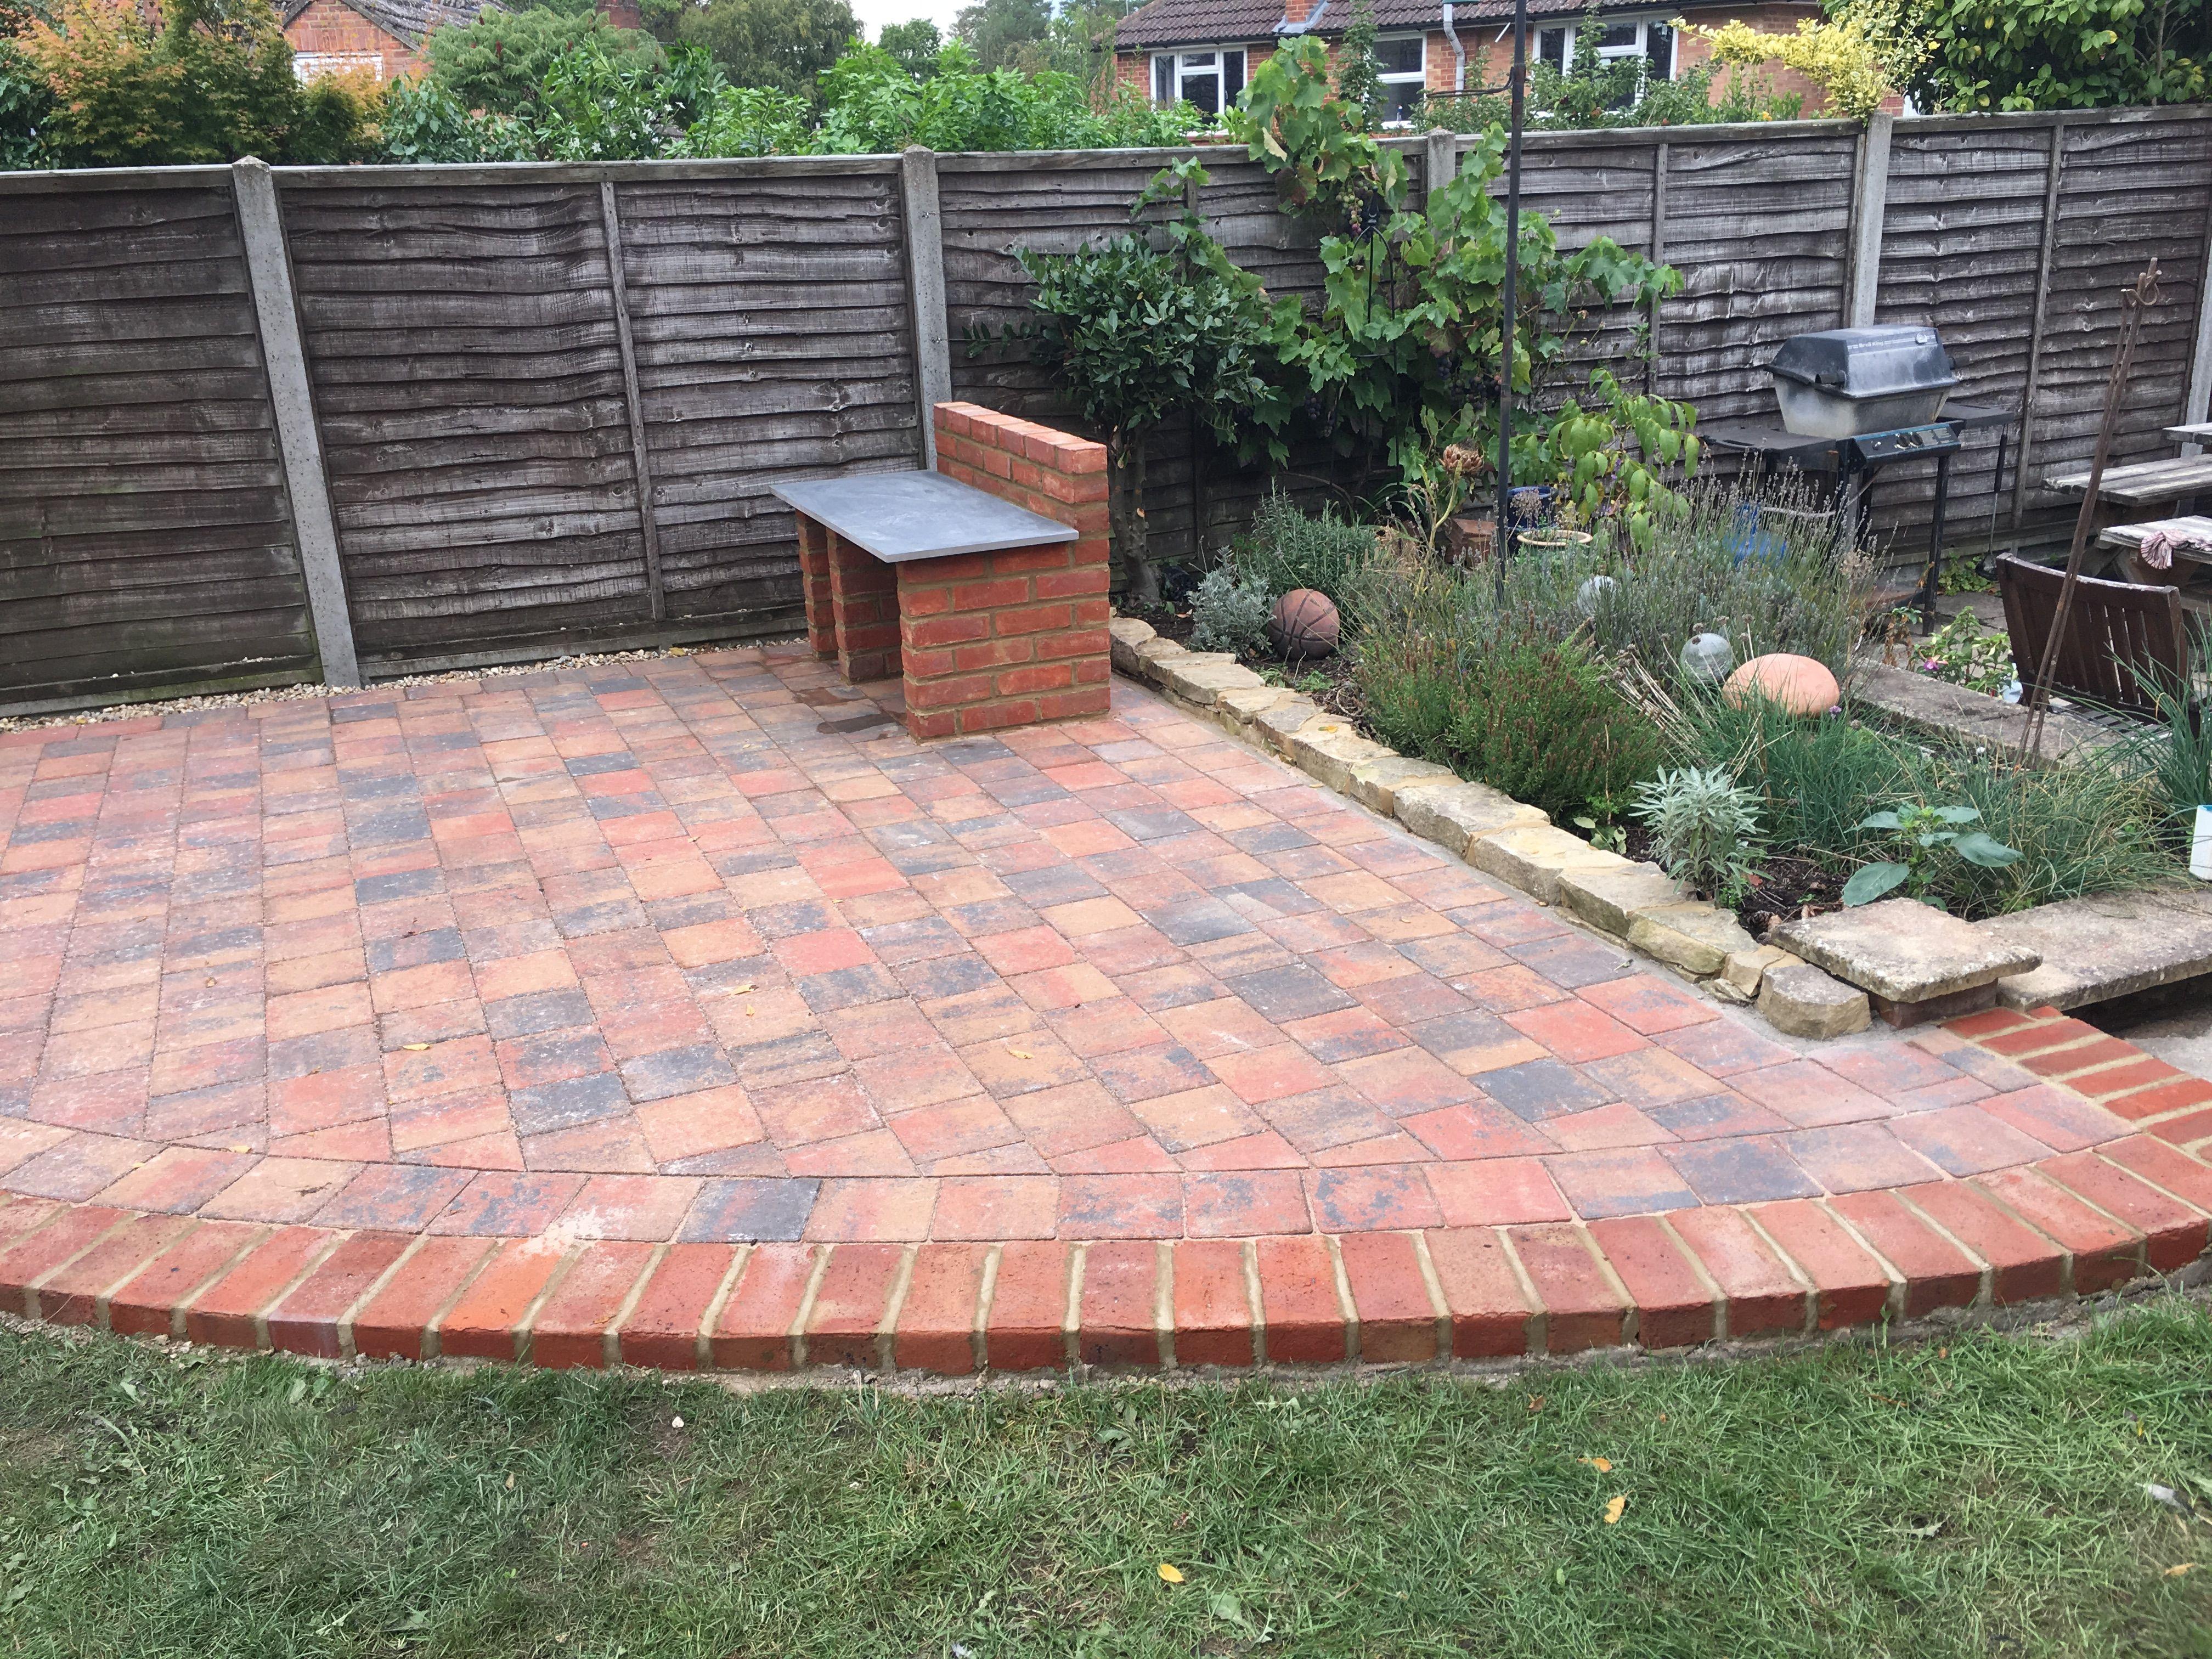 Corner Patio Edged With Matching Brick Border Patio Edging Shade Garden Patio Garden